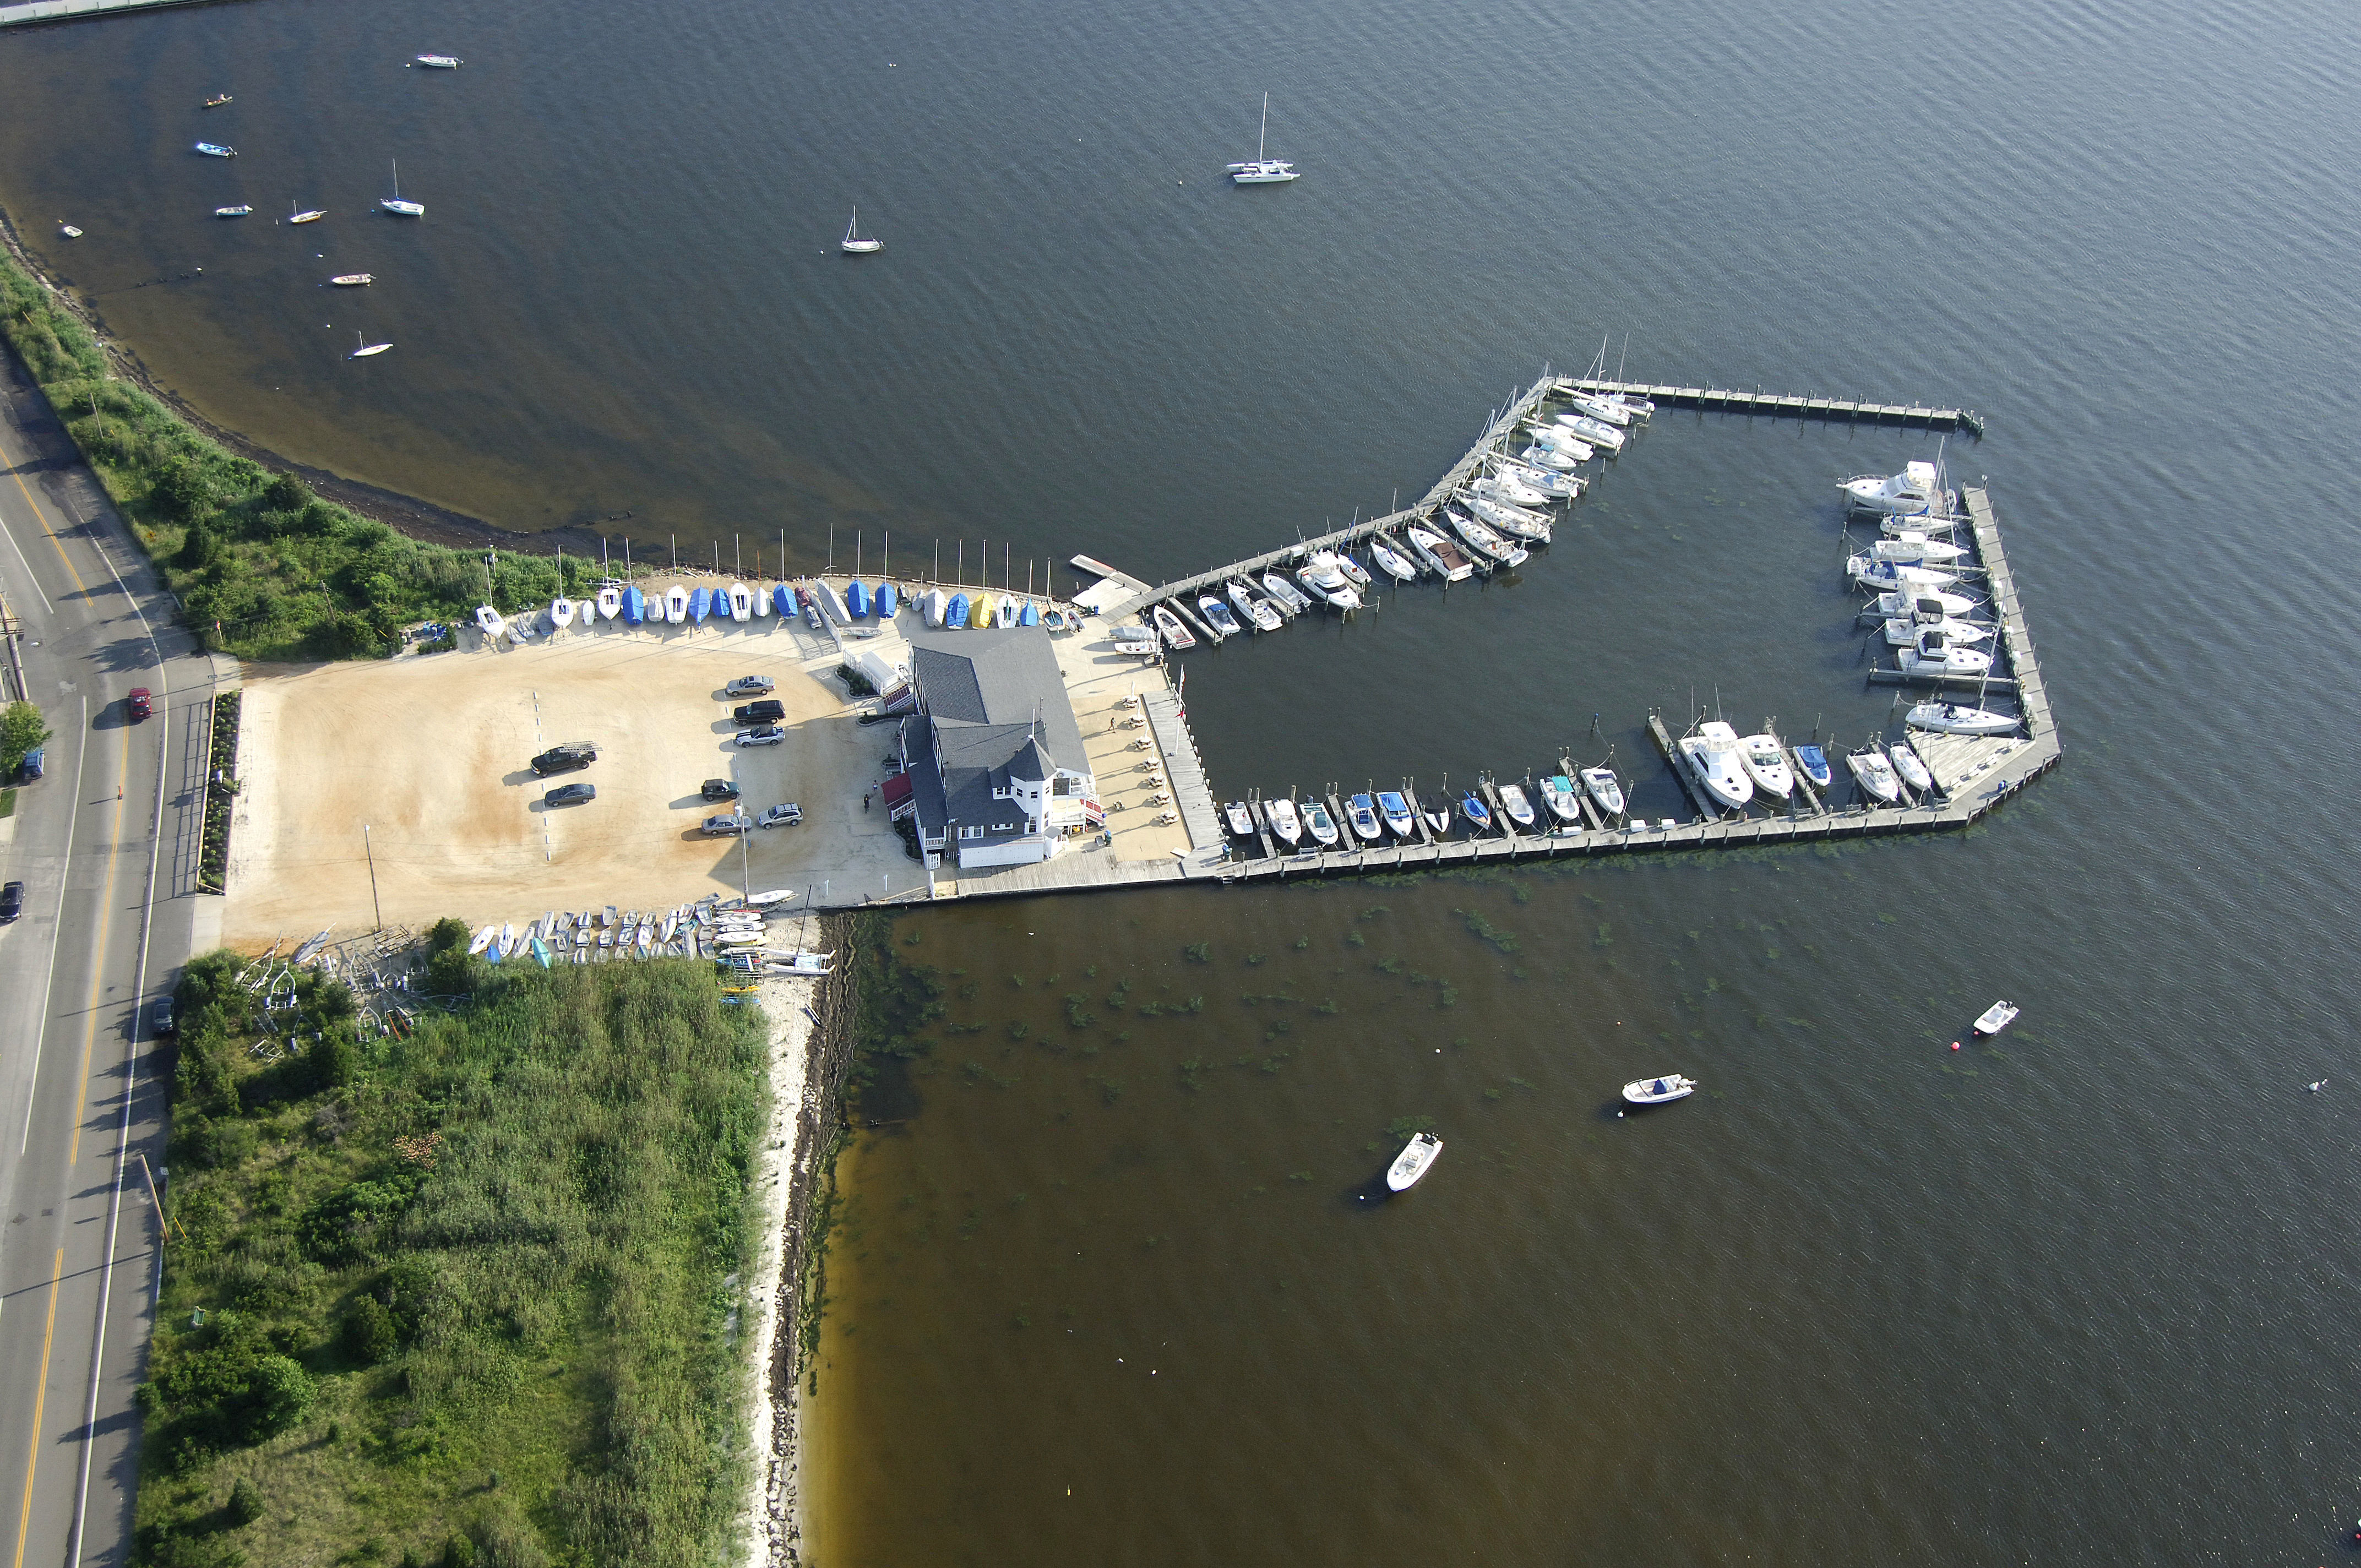 Seaside Park Yacht Club In Seaside Park Nj United States Marina Reviews Phone Number Marinas Com